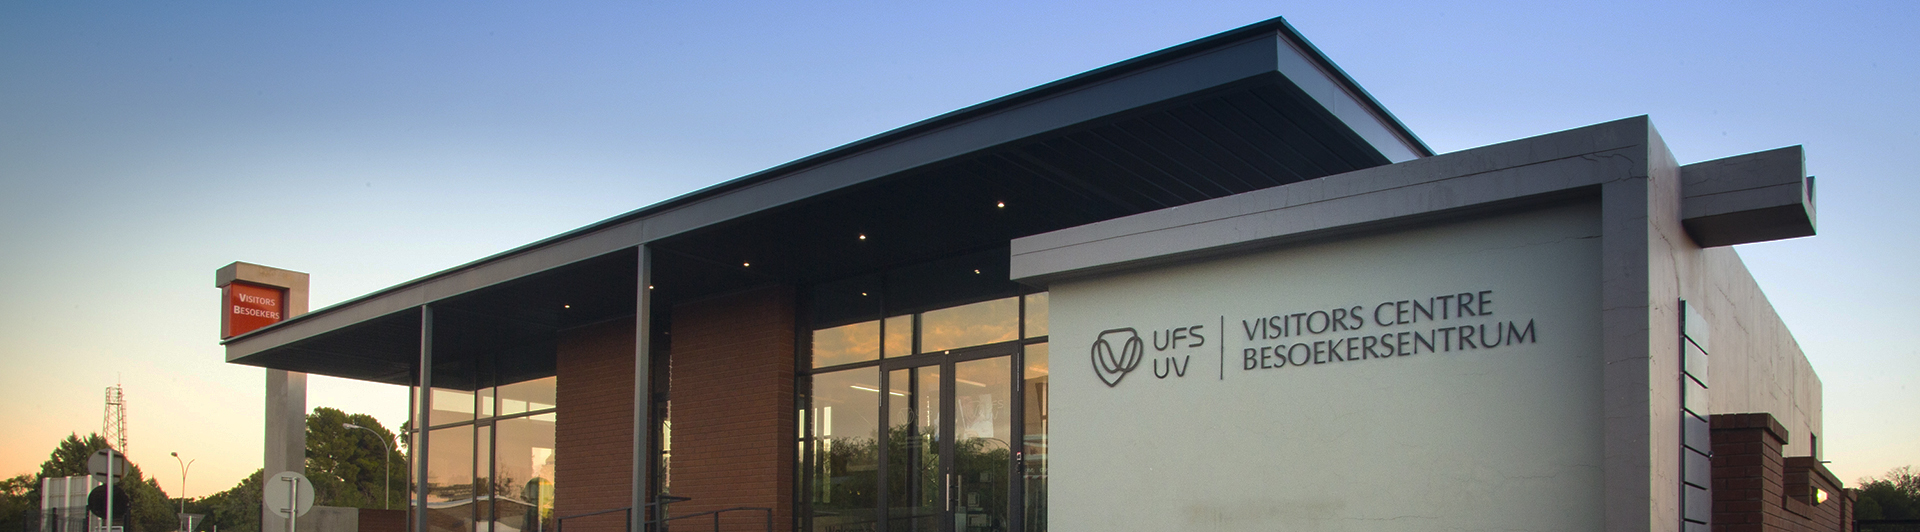 Visitors Center Building